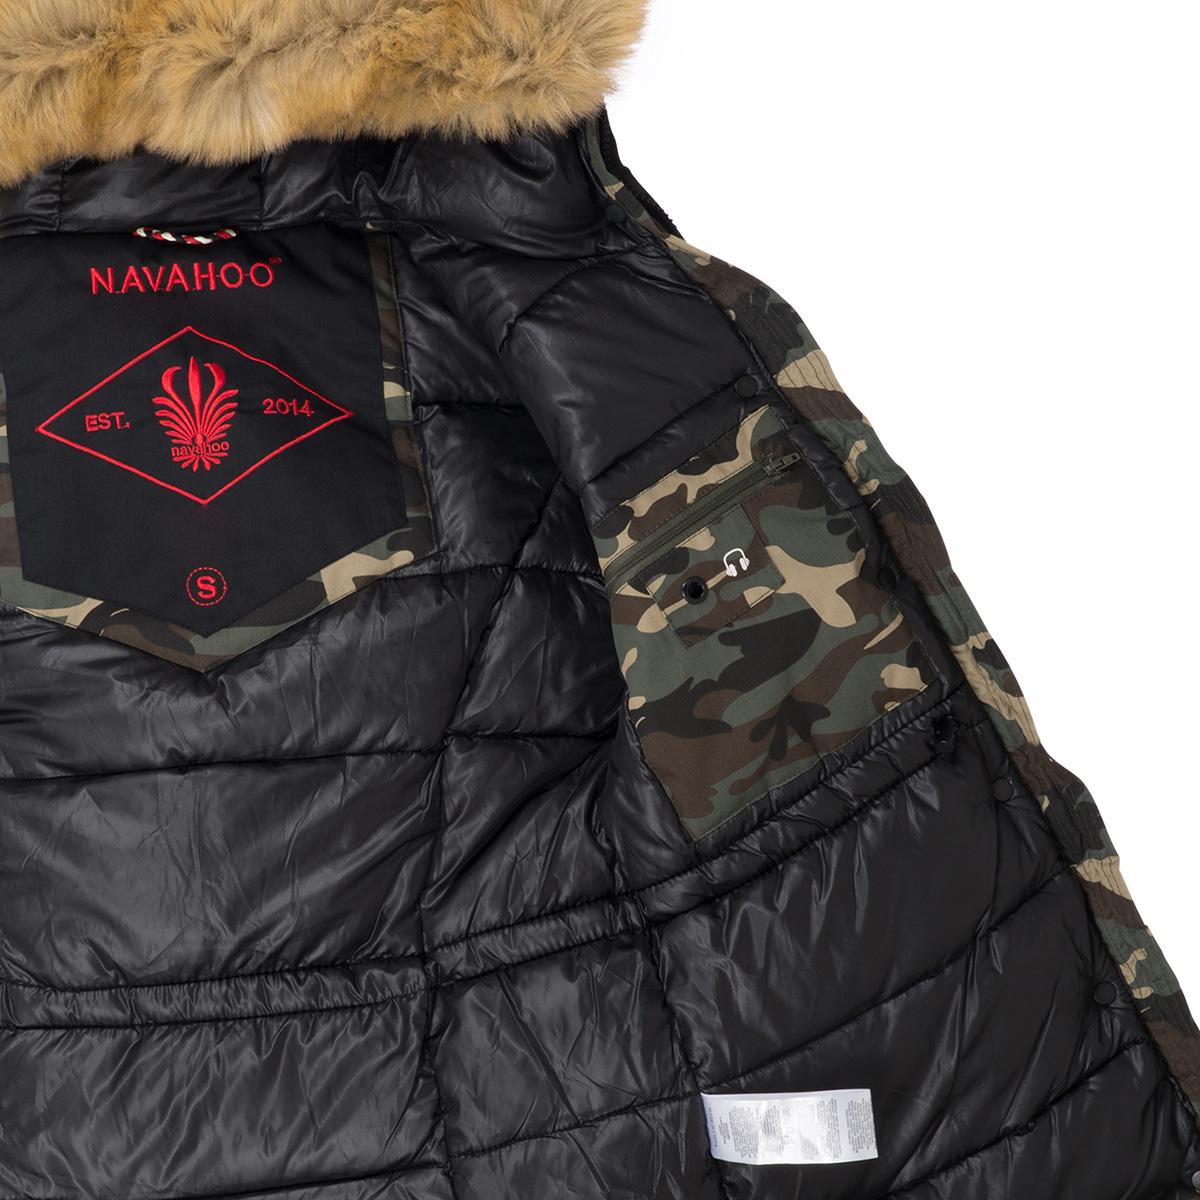 Navahoo Camouflage Damen Parka Mantel Winterjacke gefüttert Army Woodland Camo